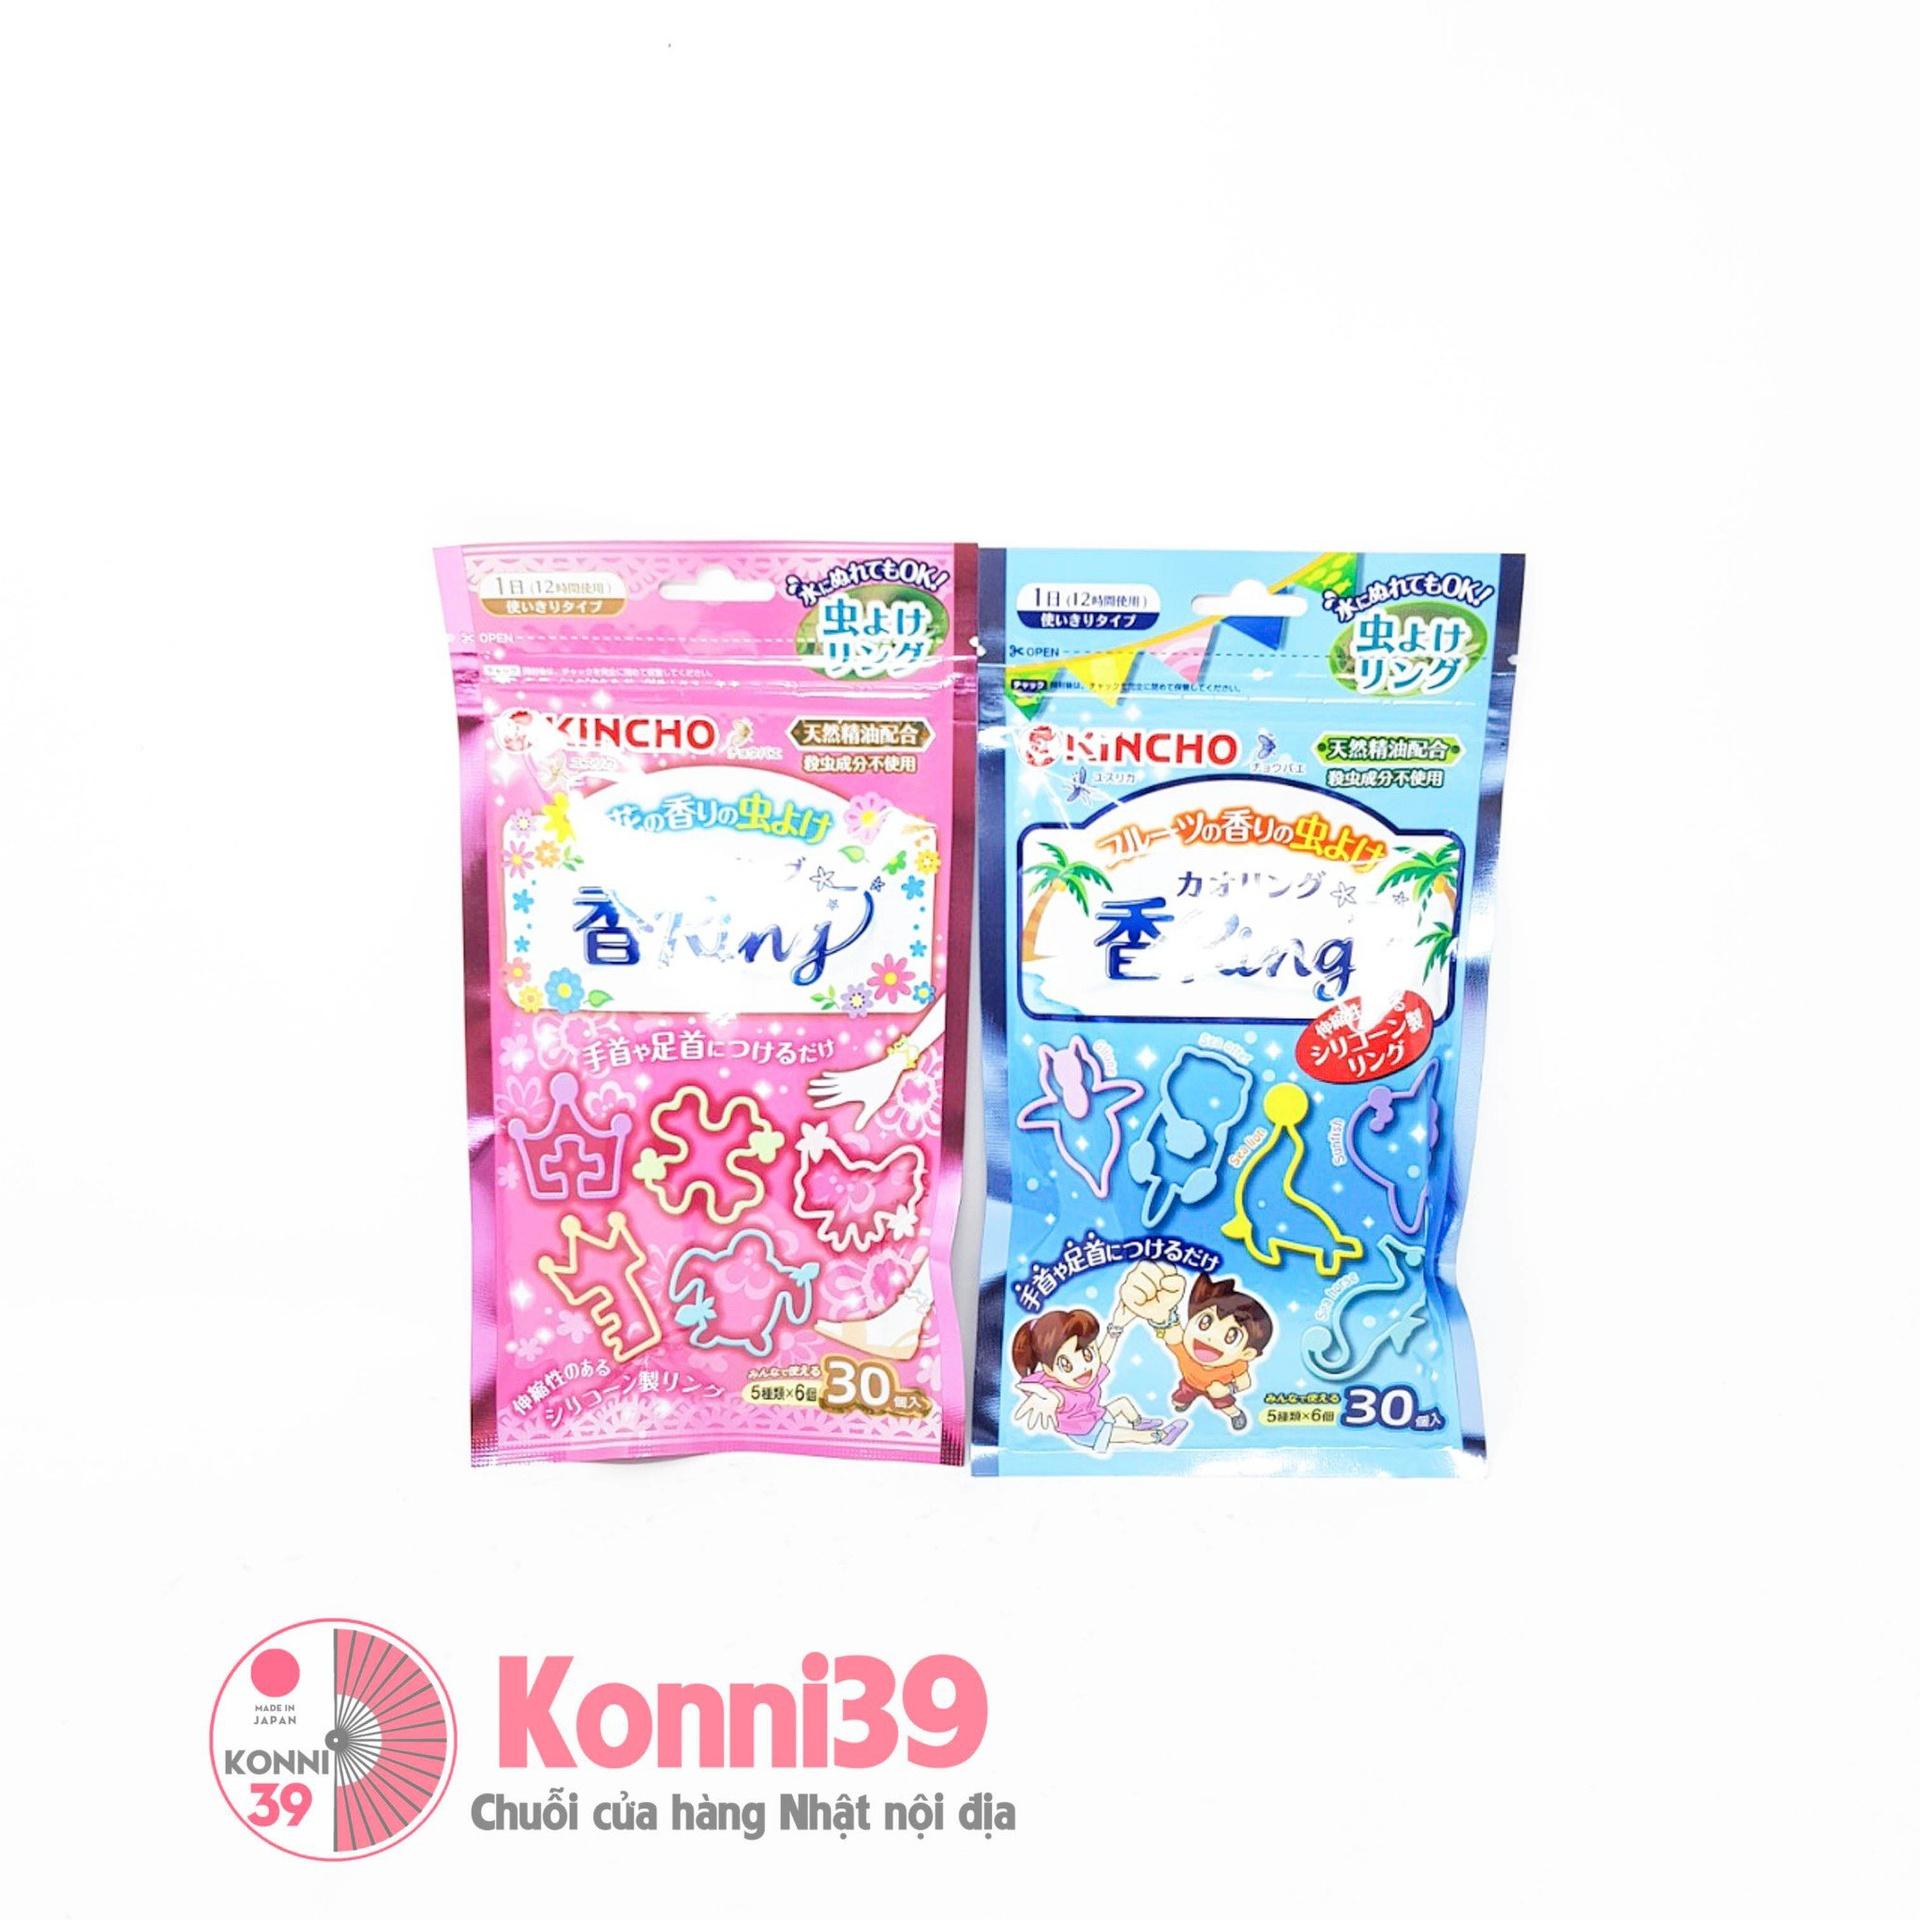 vong-chong-muoi-hinh-thu-kincho-goi-30c